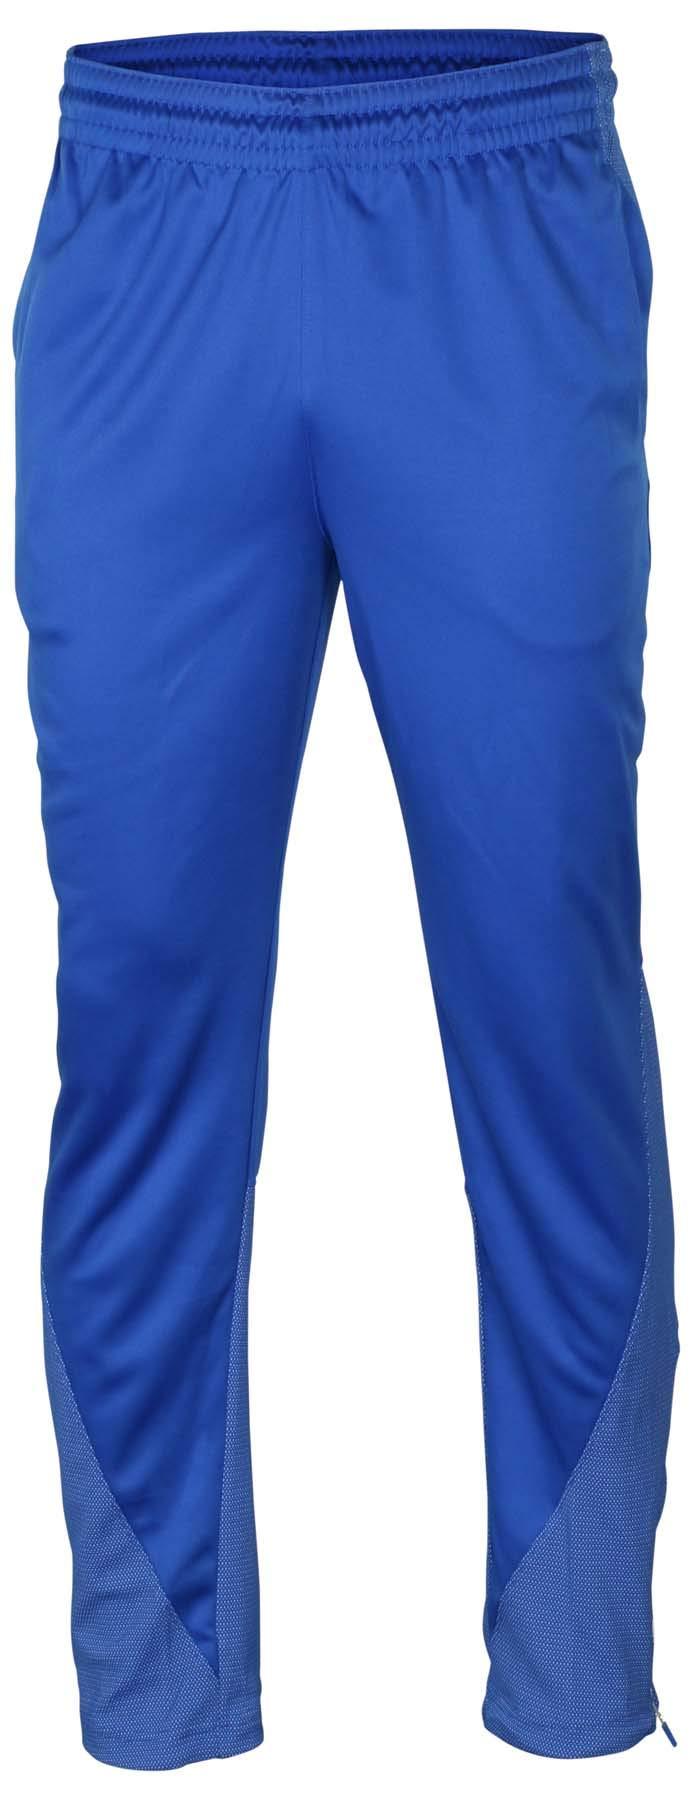 Nike Jordan Men's Flight Team Basketball Pants-Royal Blue-Medium by Nike